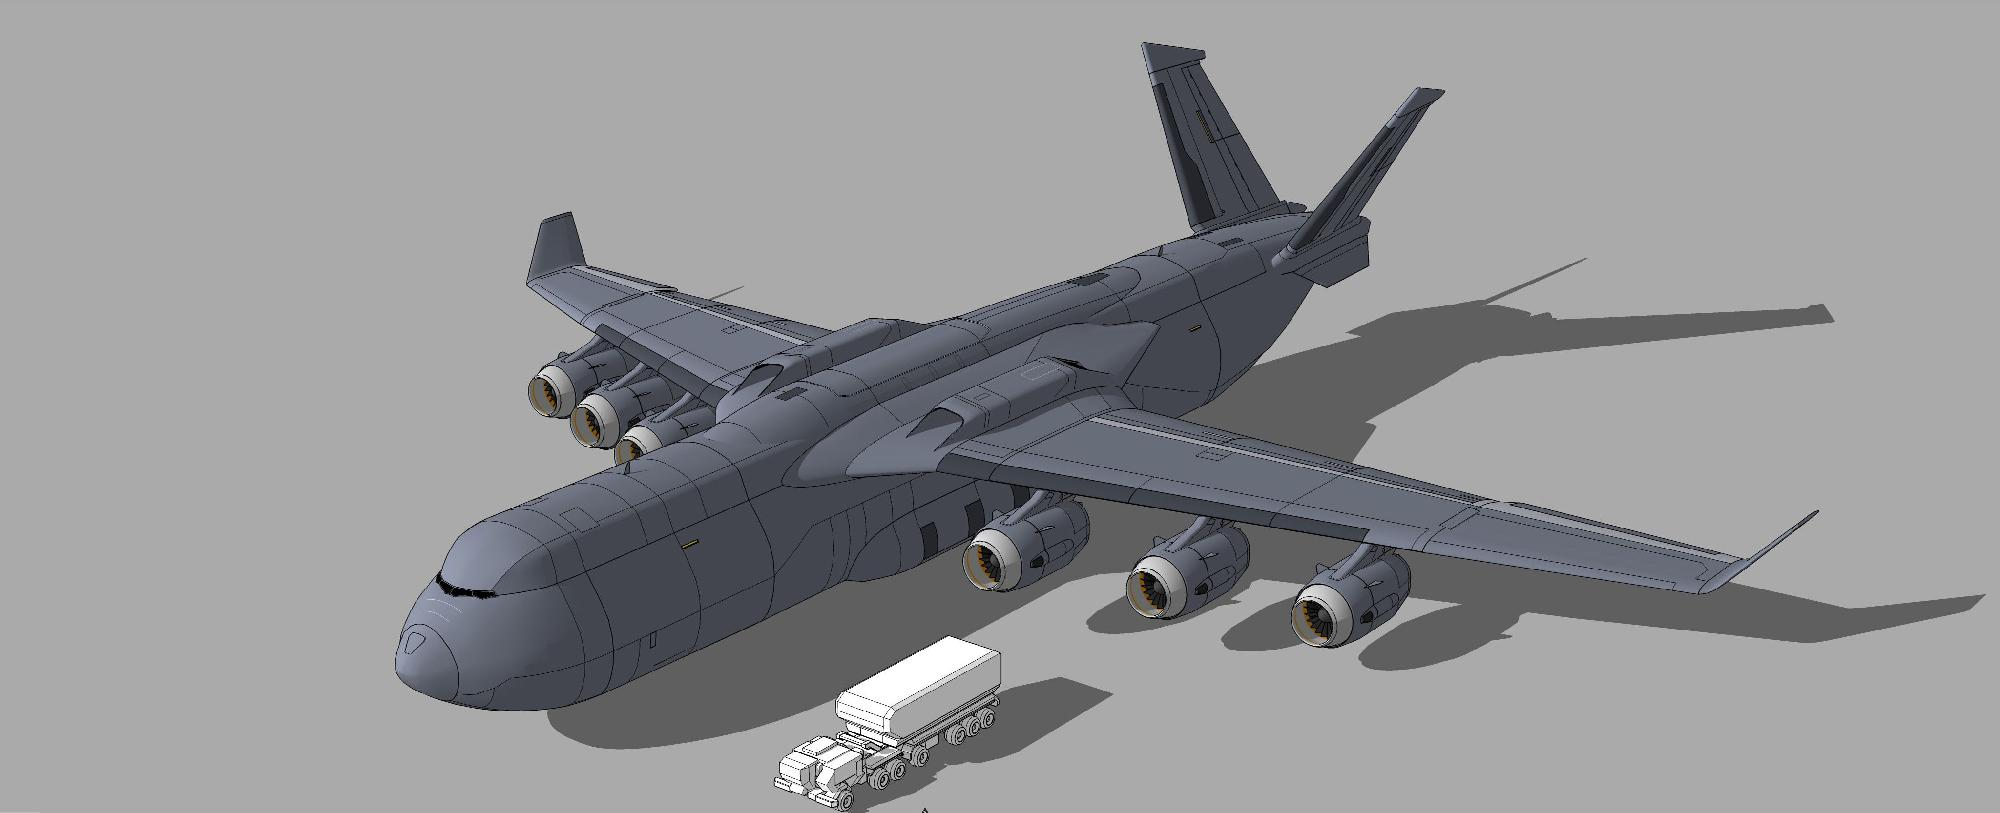 Cargo plane resembles C-17A Globemaster III